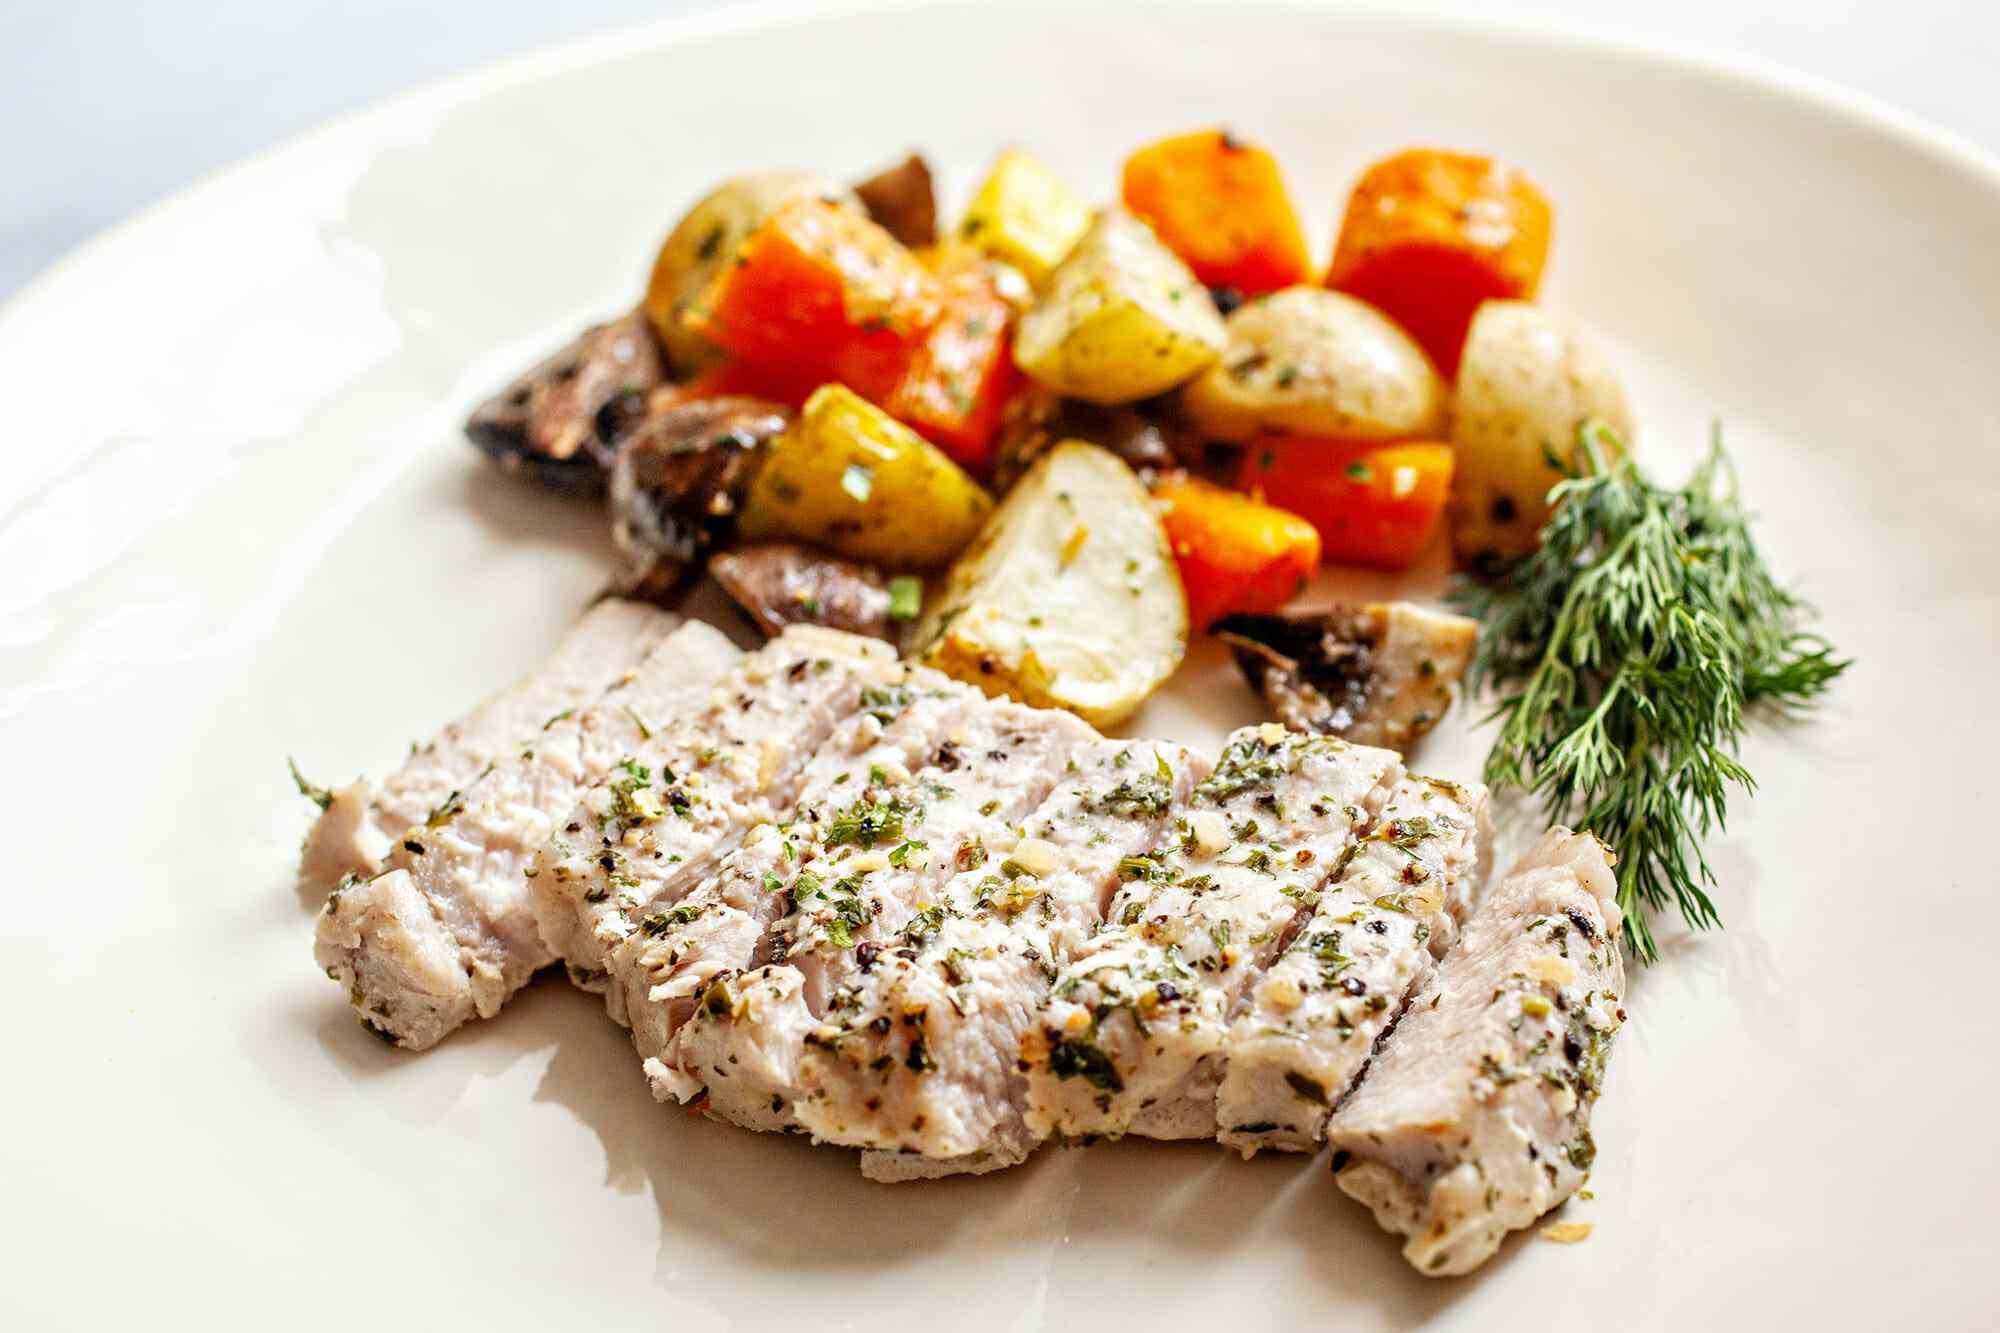 Pork Chop Sheet Pan Dinner Recipe serve the pork chops